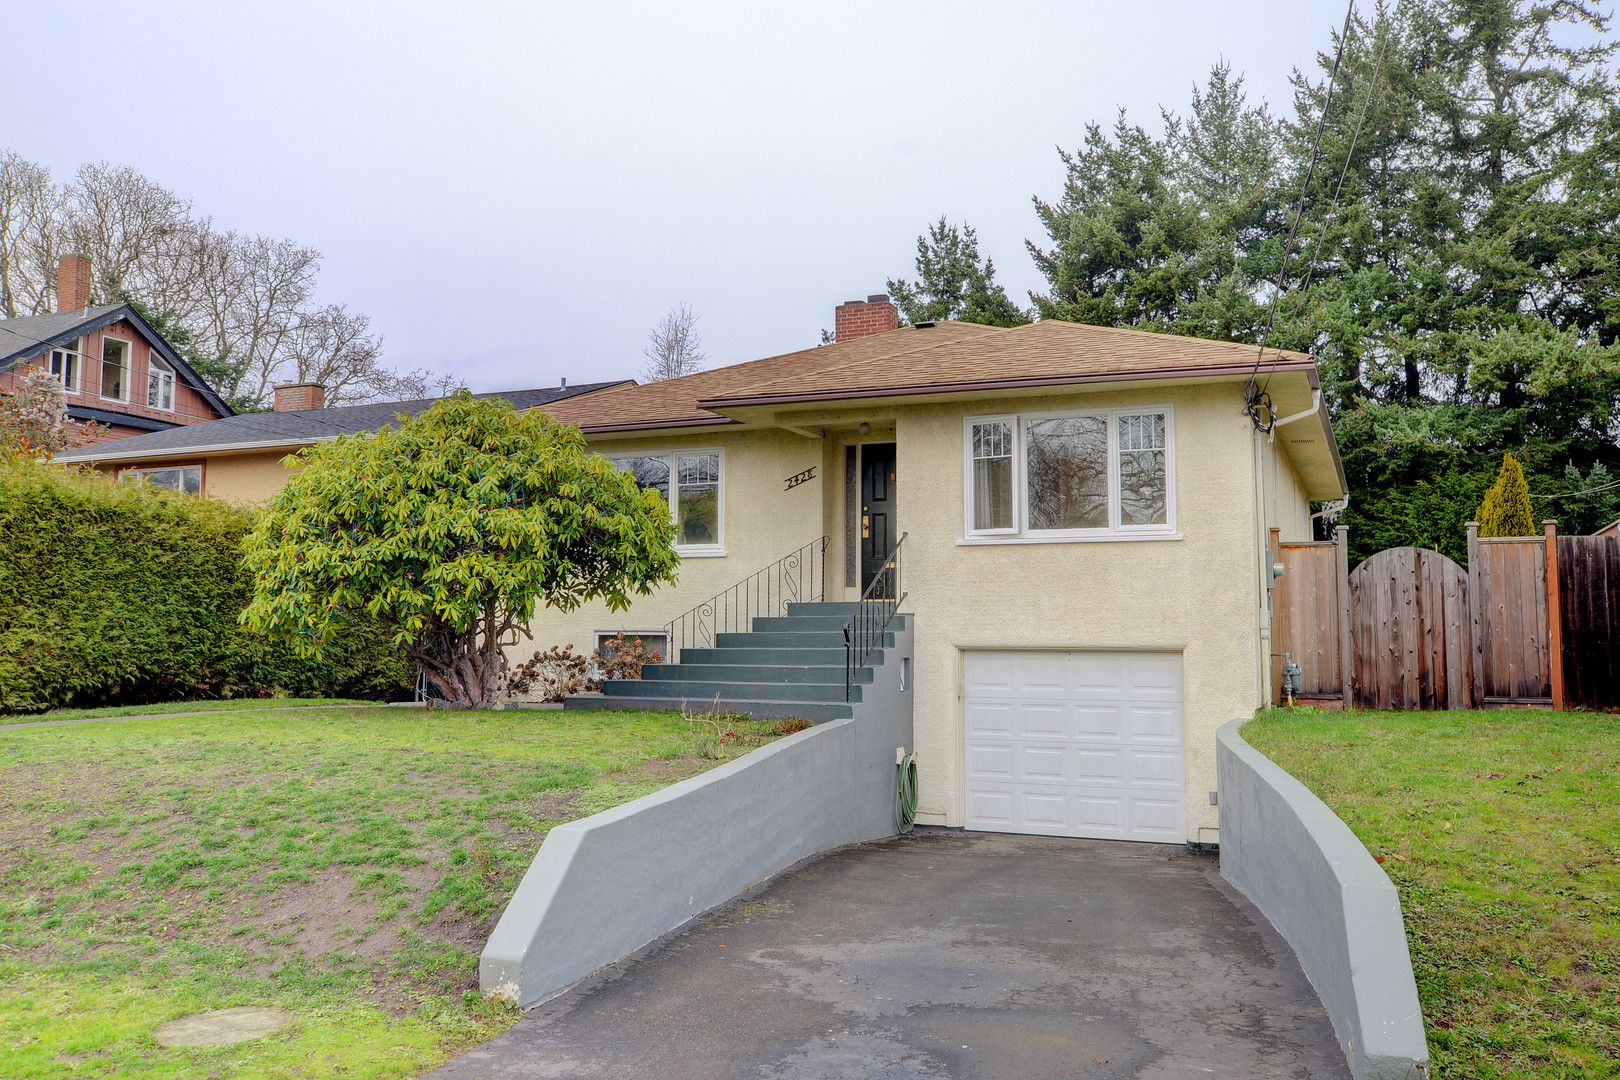 Main Photo: 2428 Dalhousie Street in VICTORIA: OB Estevan Single Family Detached for sale (Oak Bay)  : MLS®# 386618